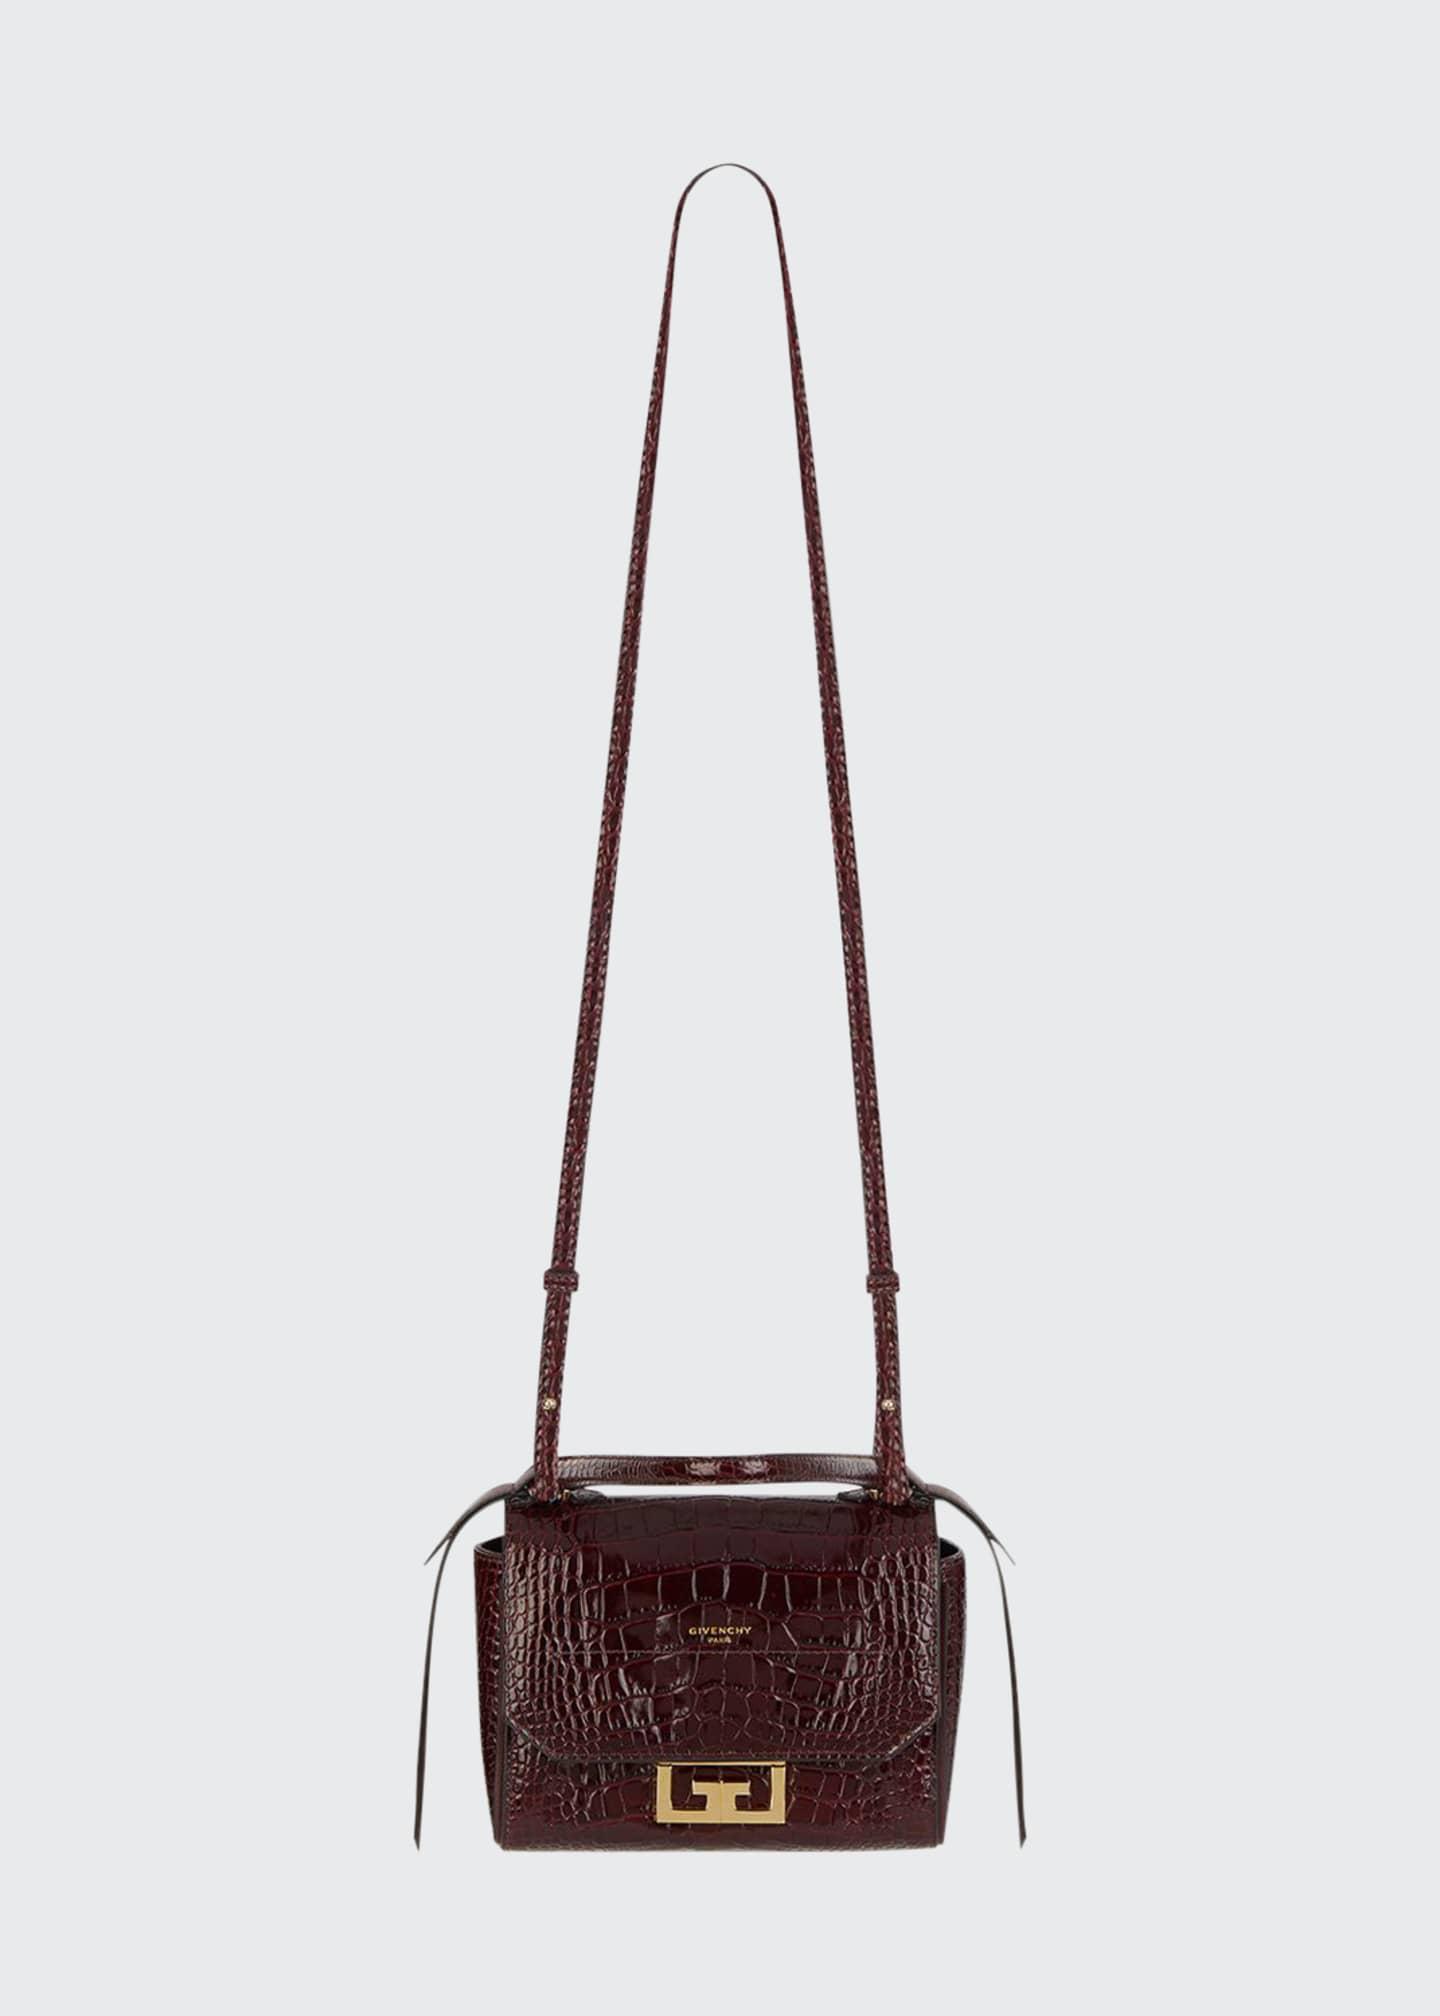 Givenchy Eden Mini Crocodile-Embossed Crossbody Bag